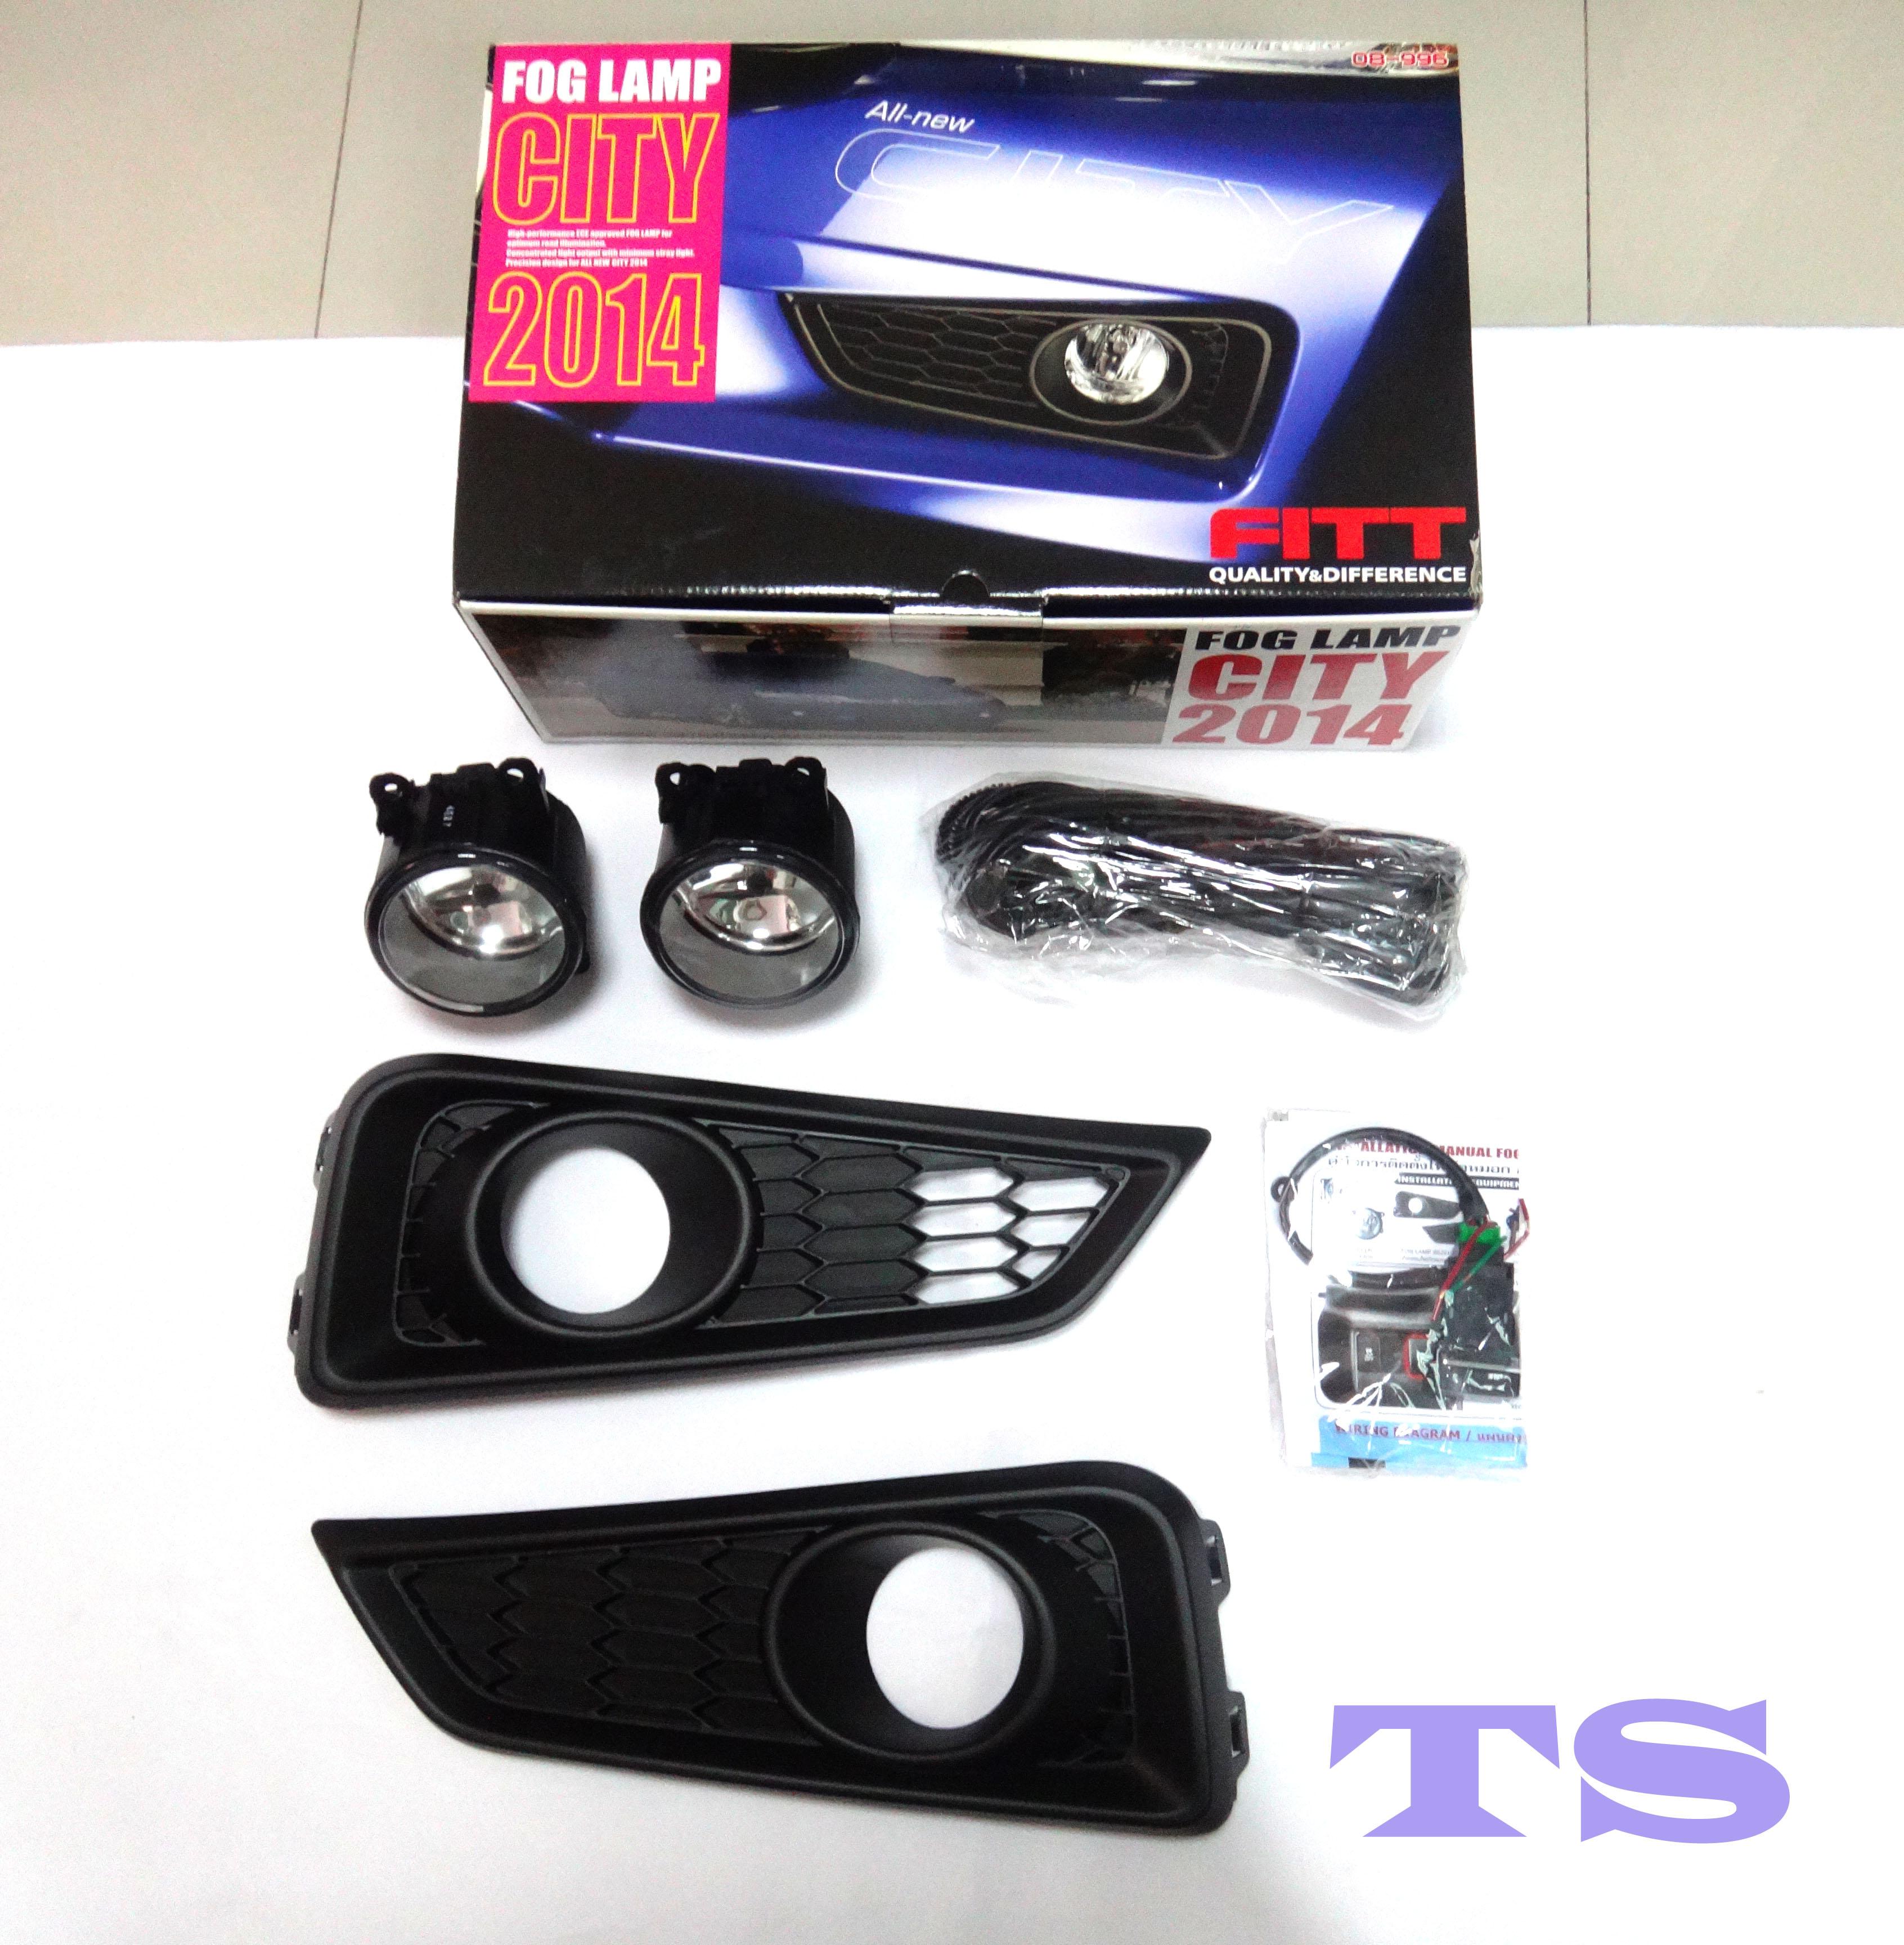 Set Kit Fog Lamp Spot Light Replacement For Honda Civic 4dr FB6 Sedan 2016 2017